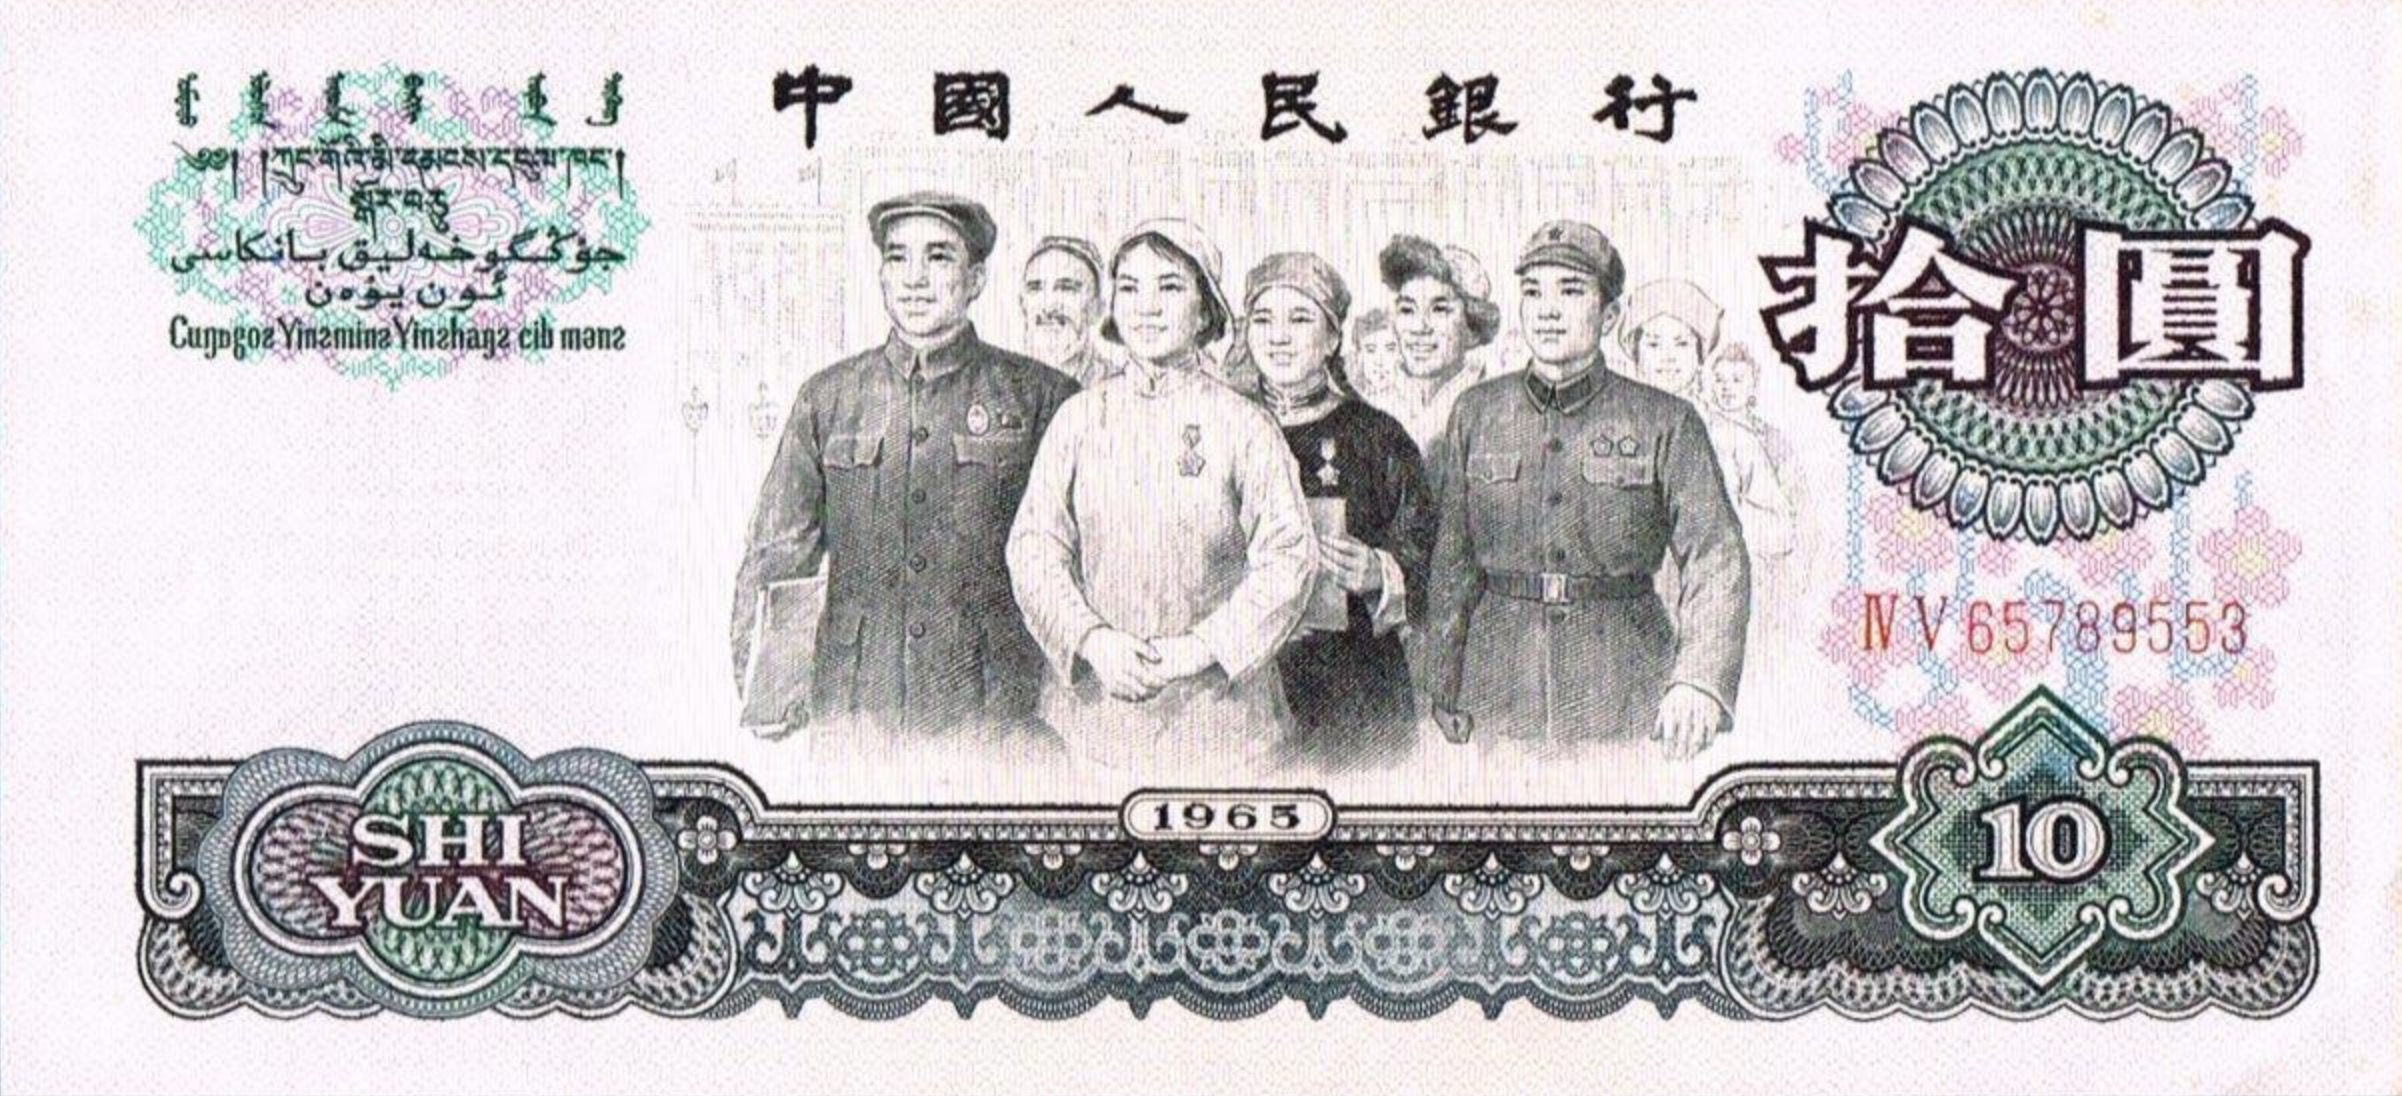 EF WE COMBINE China Banknote P 879a-4986 10 Yuan 1965 3 Roman numerals